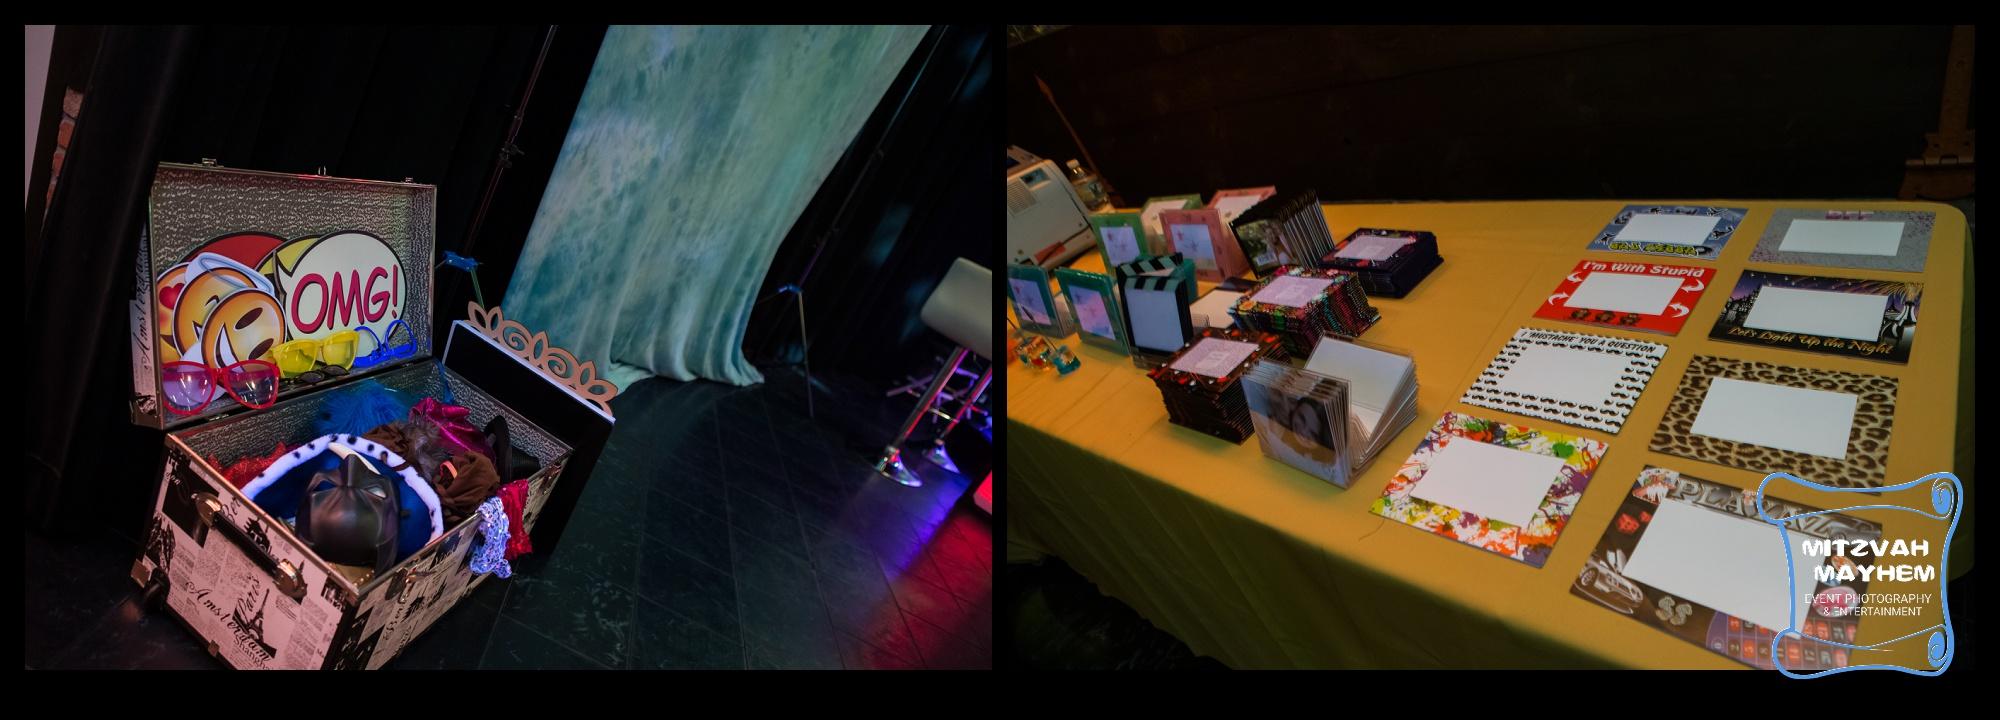 powerhouse-studios-mitzvah-7914.jpg